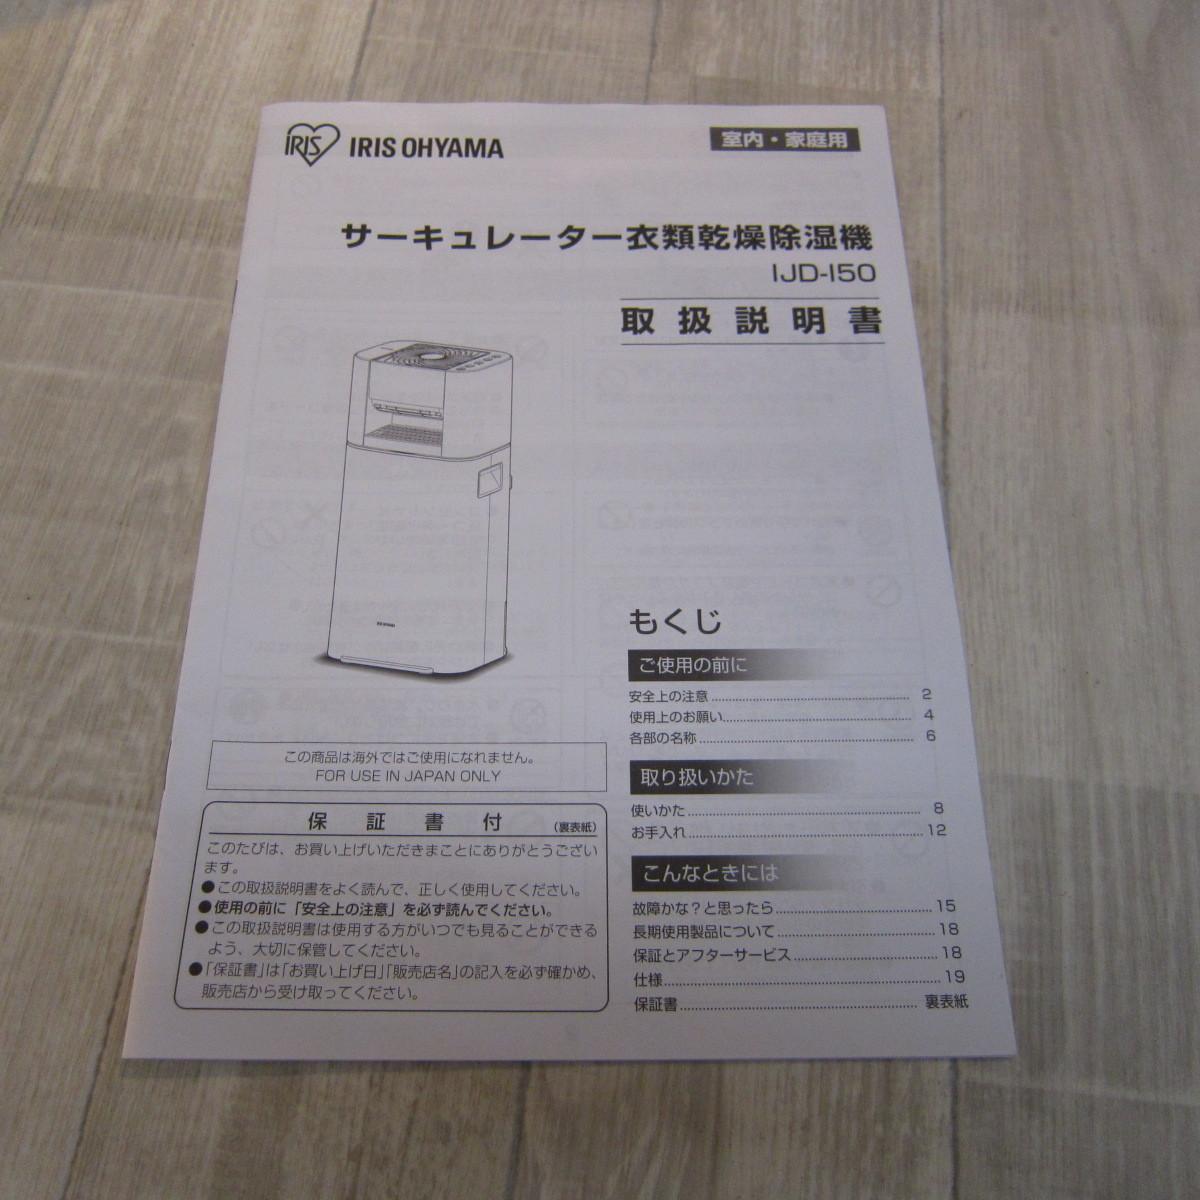 S6081【未使用】アイリスオーヤマ 衣類乾燥除湿機 スピード乾燥 サーキュレーター機能付 デシカント式 ホワイト IJD-I50_画像8